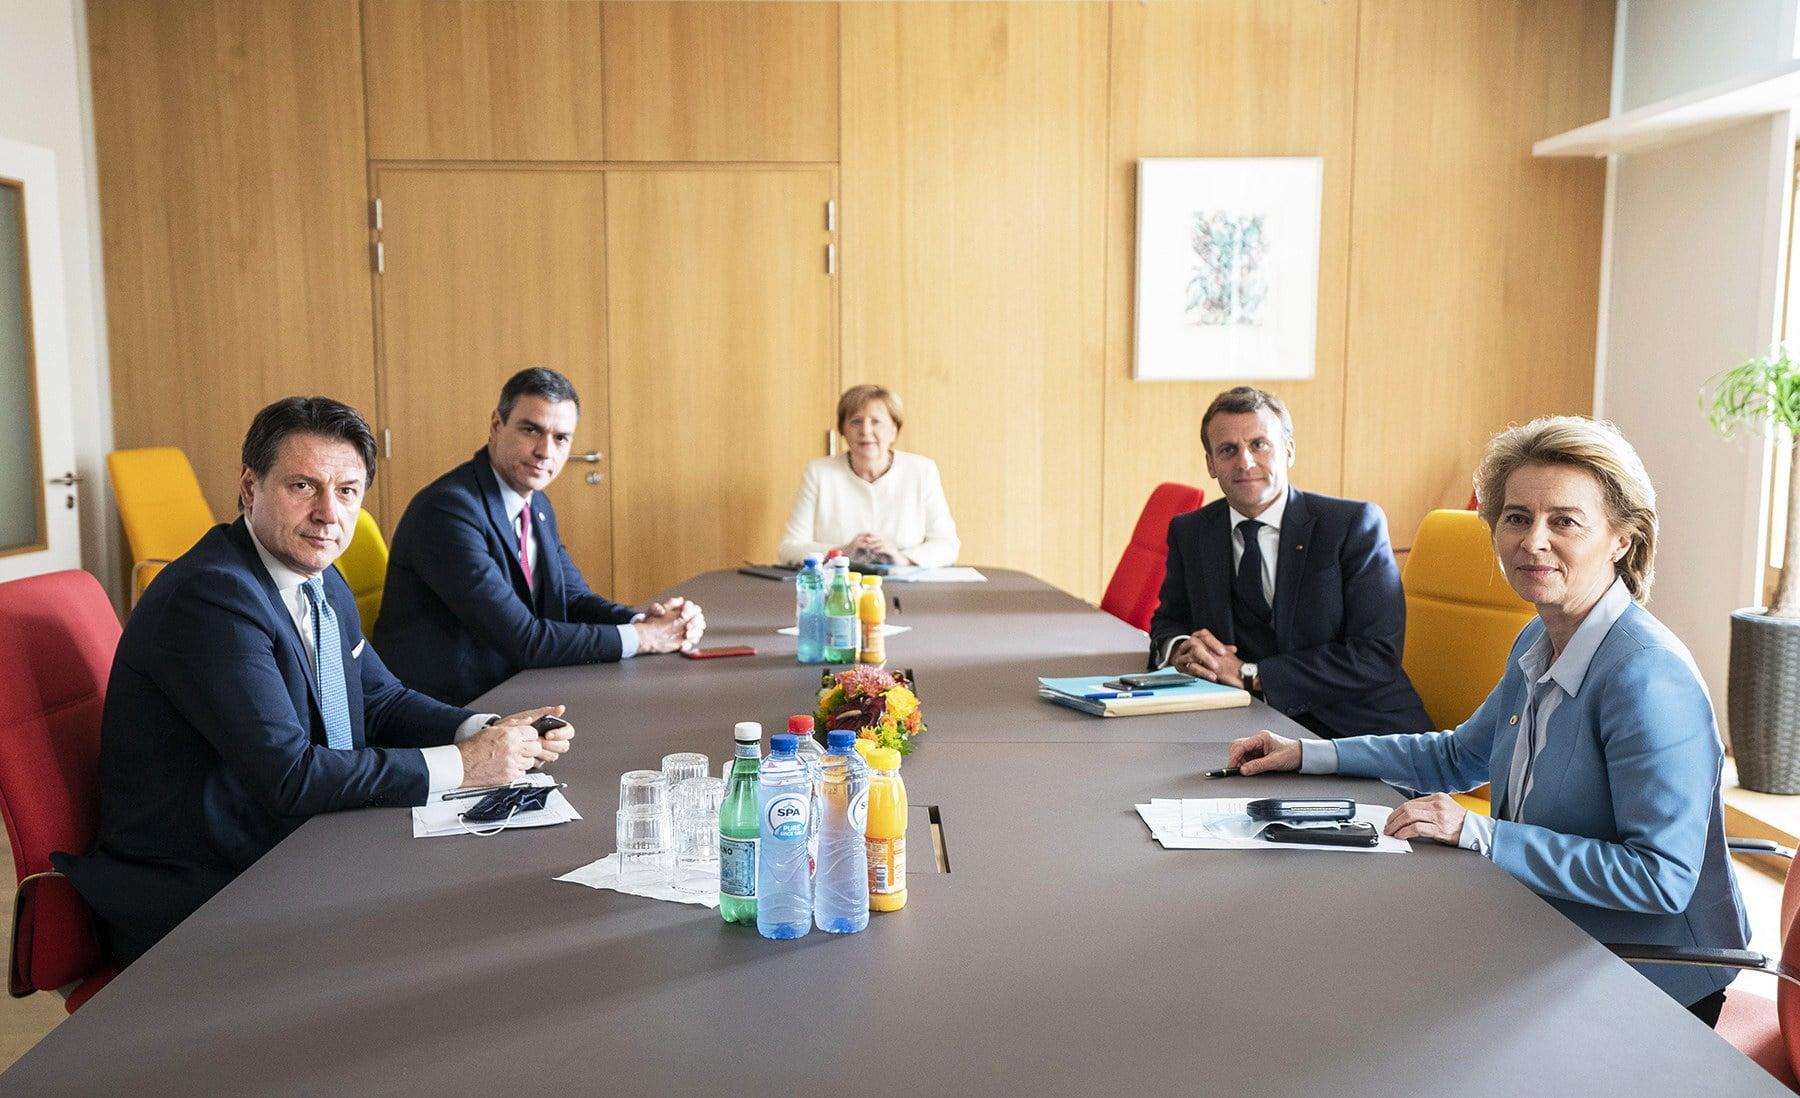 Giuseppe Conte Pedro Sanchez Angela Merkel Emmanuel Macron e Ursula von der Leyen